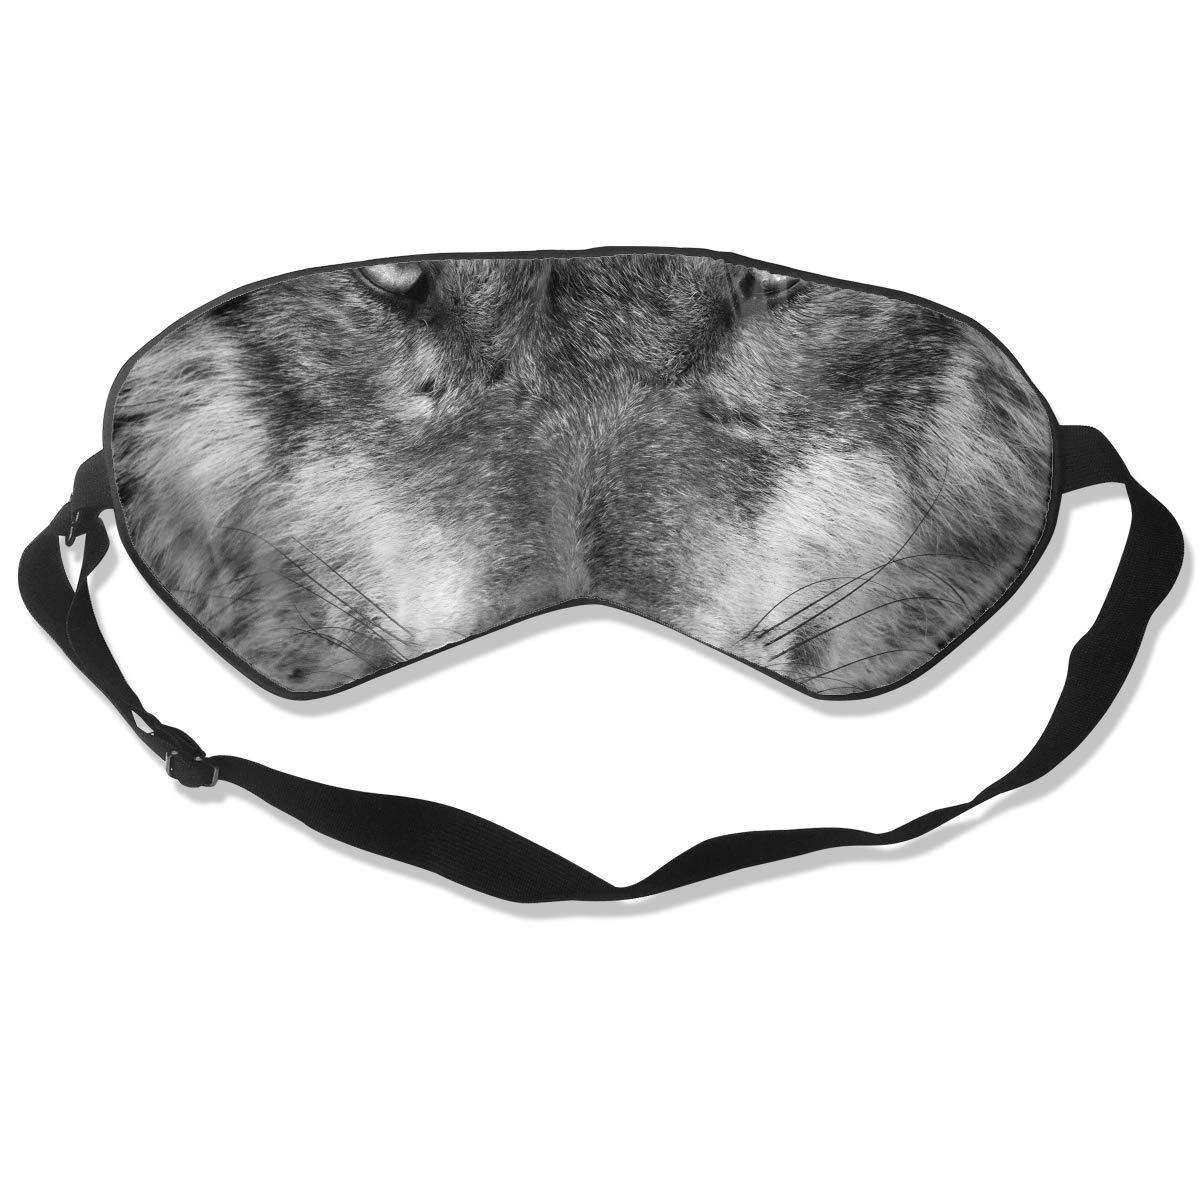 Homlife Sleep Mask 100% Silk Eye Mask Wolf Eyes Funny Pattern Eye Cover Sleeping Mask for Travelling, Night Noon Nap, Mediation Or Yoga by Homlife